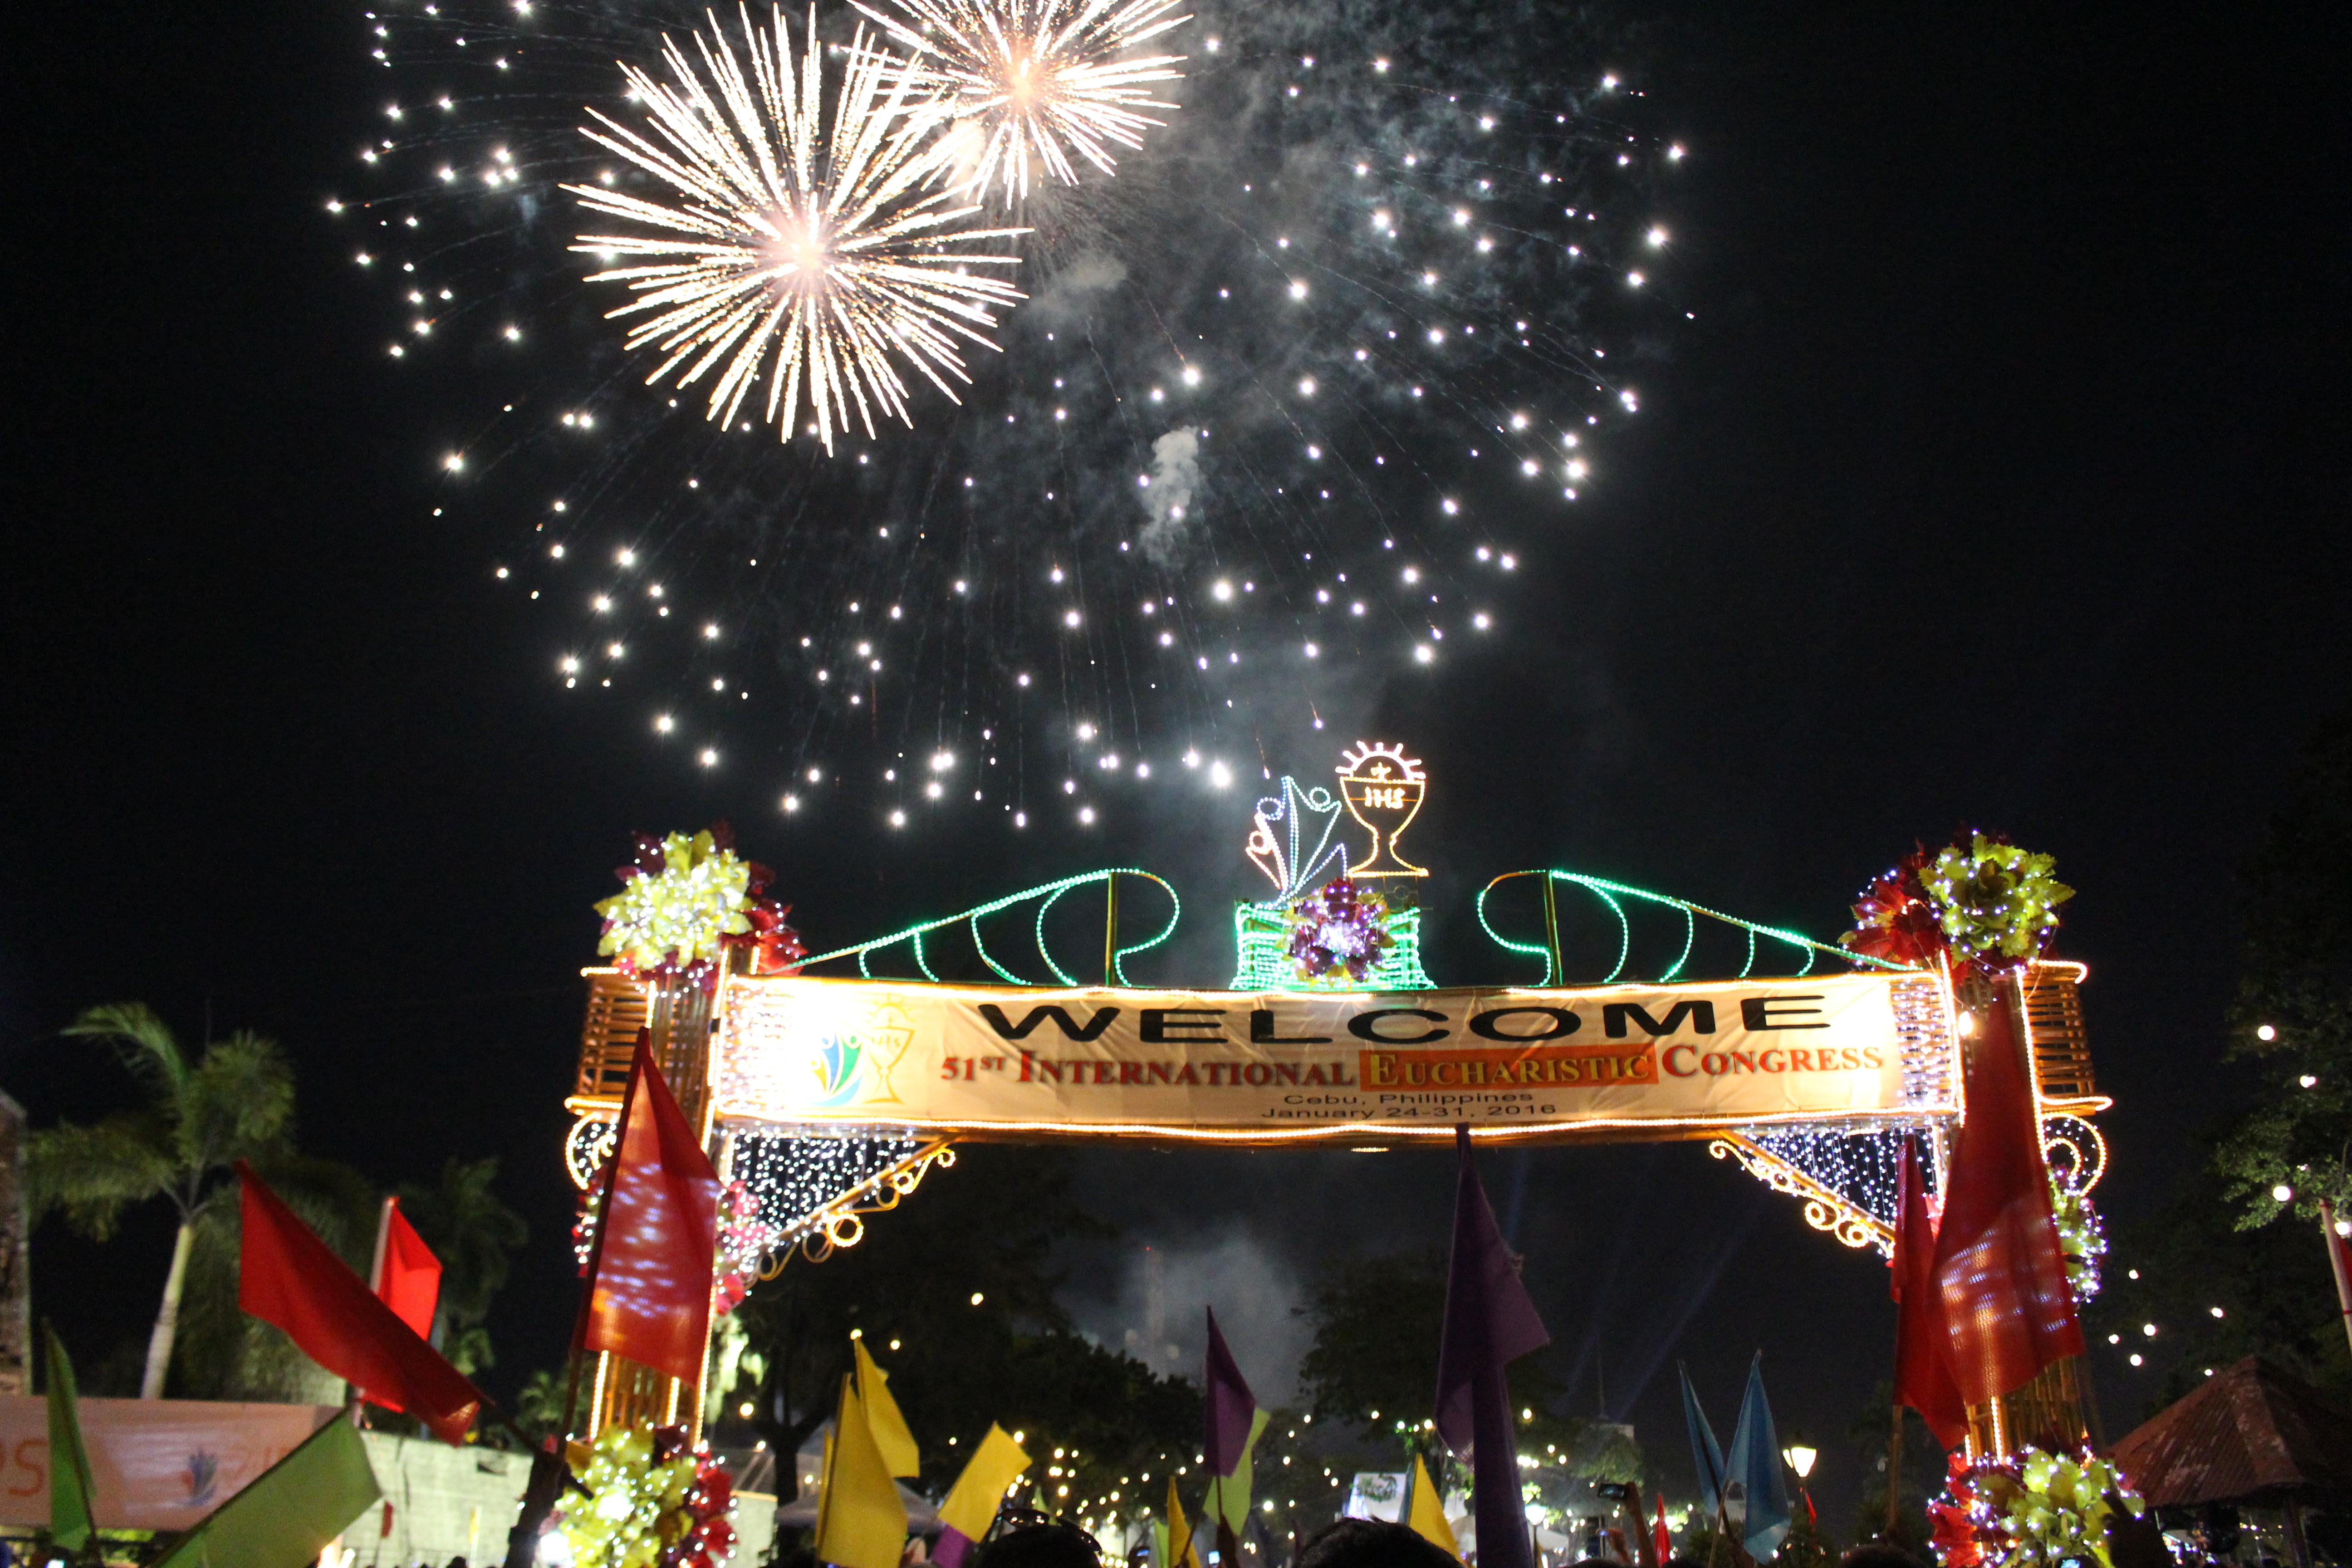 Un grand feu d'artifice a clos la messe d'ouverture du Congrès eucharistique international © DR